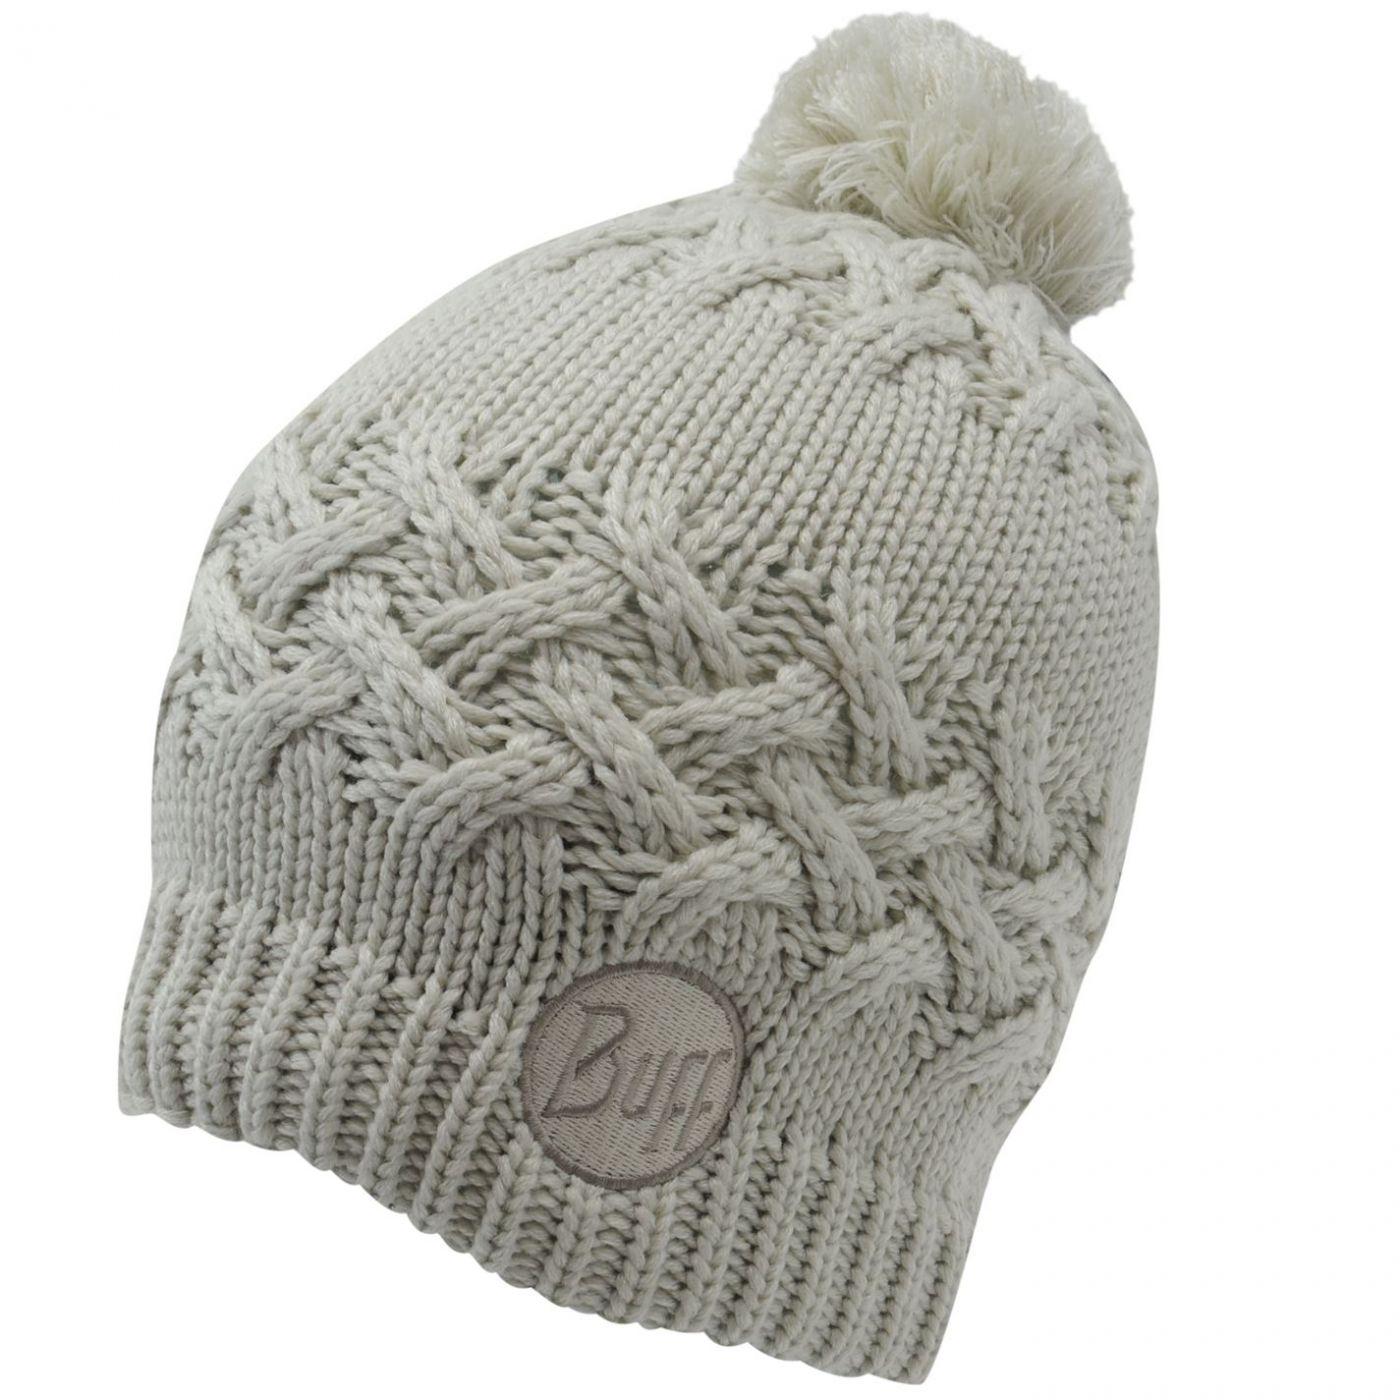 Buff Knit Hats Unisex